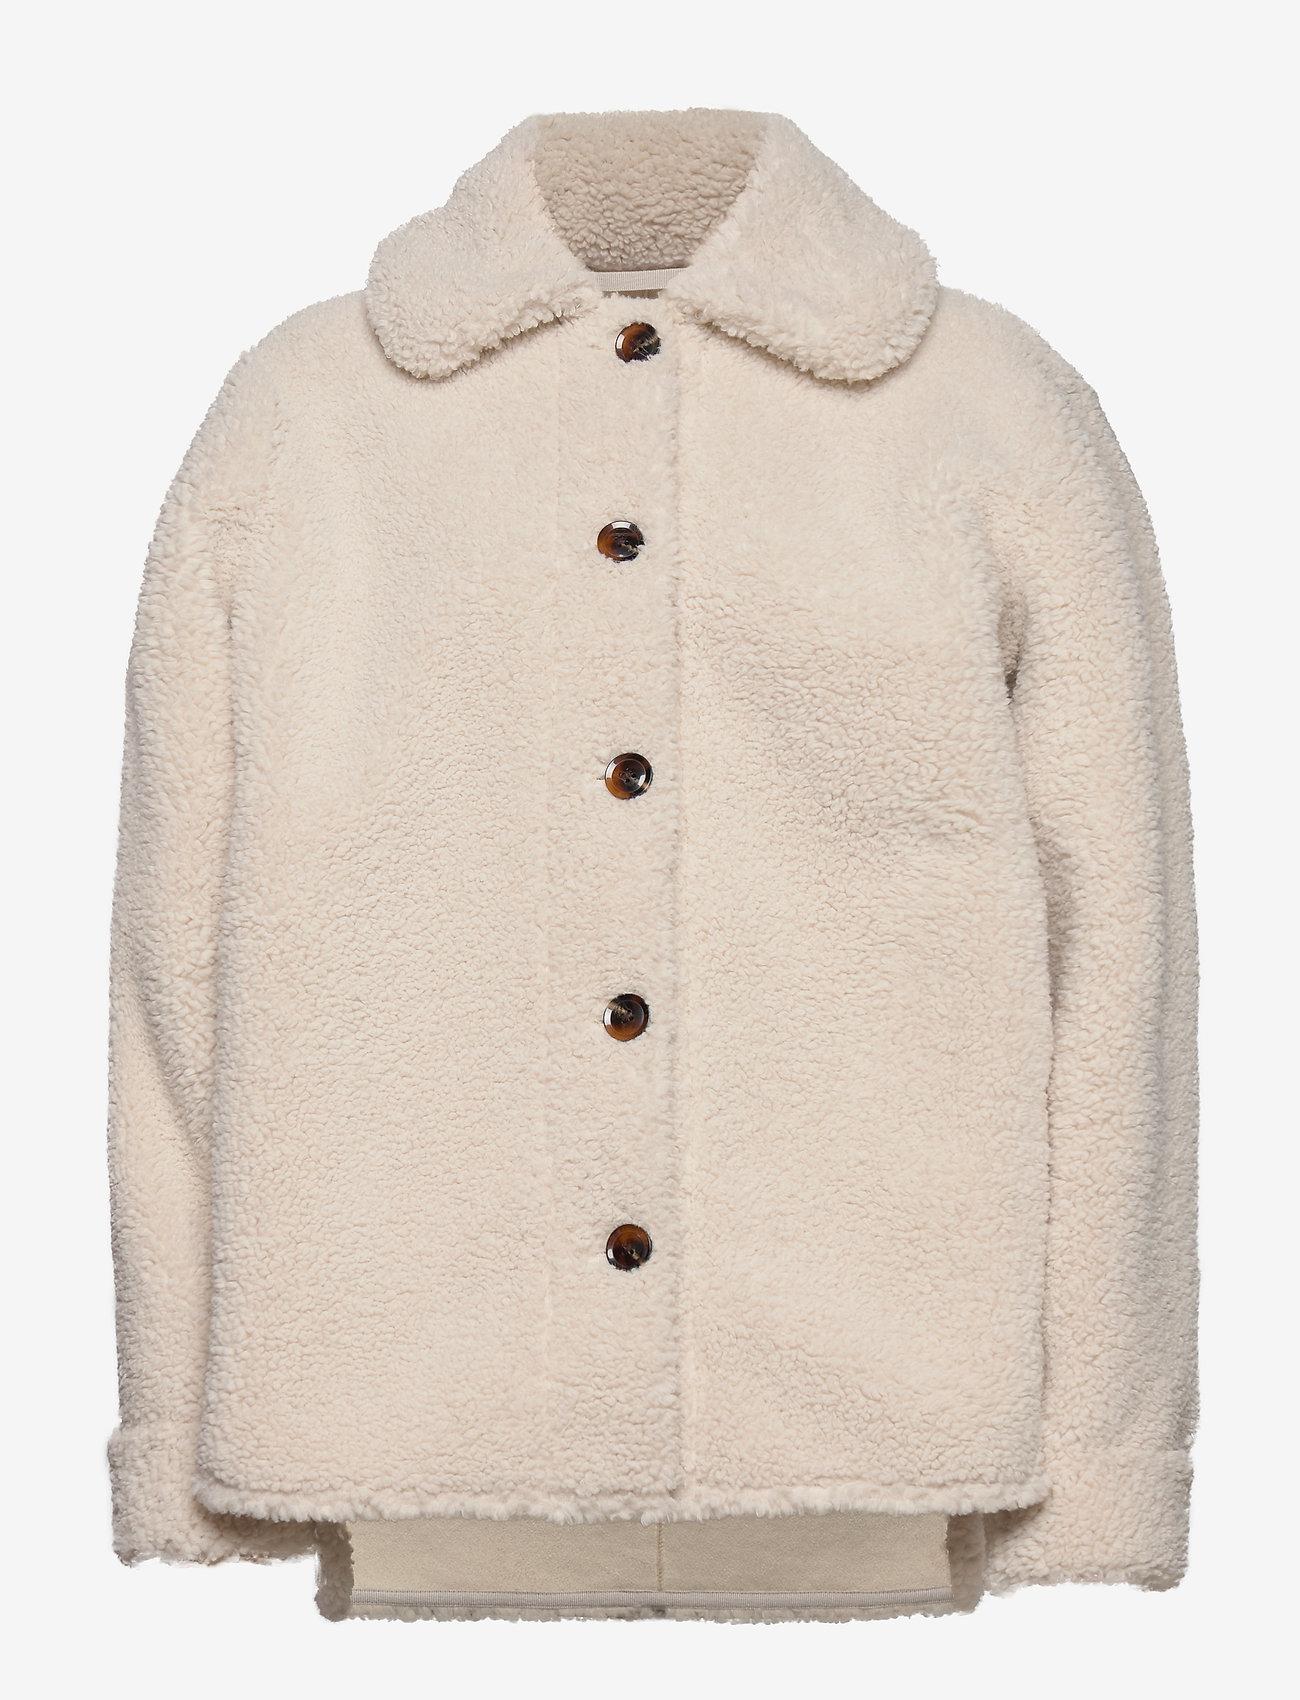 Samsøe Samsøe - Aylin jacket 12856 - wool jackets - whisper white - 1